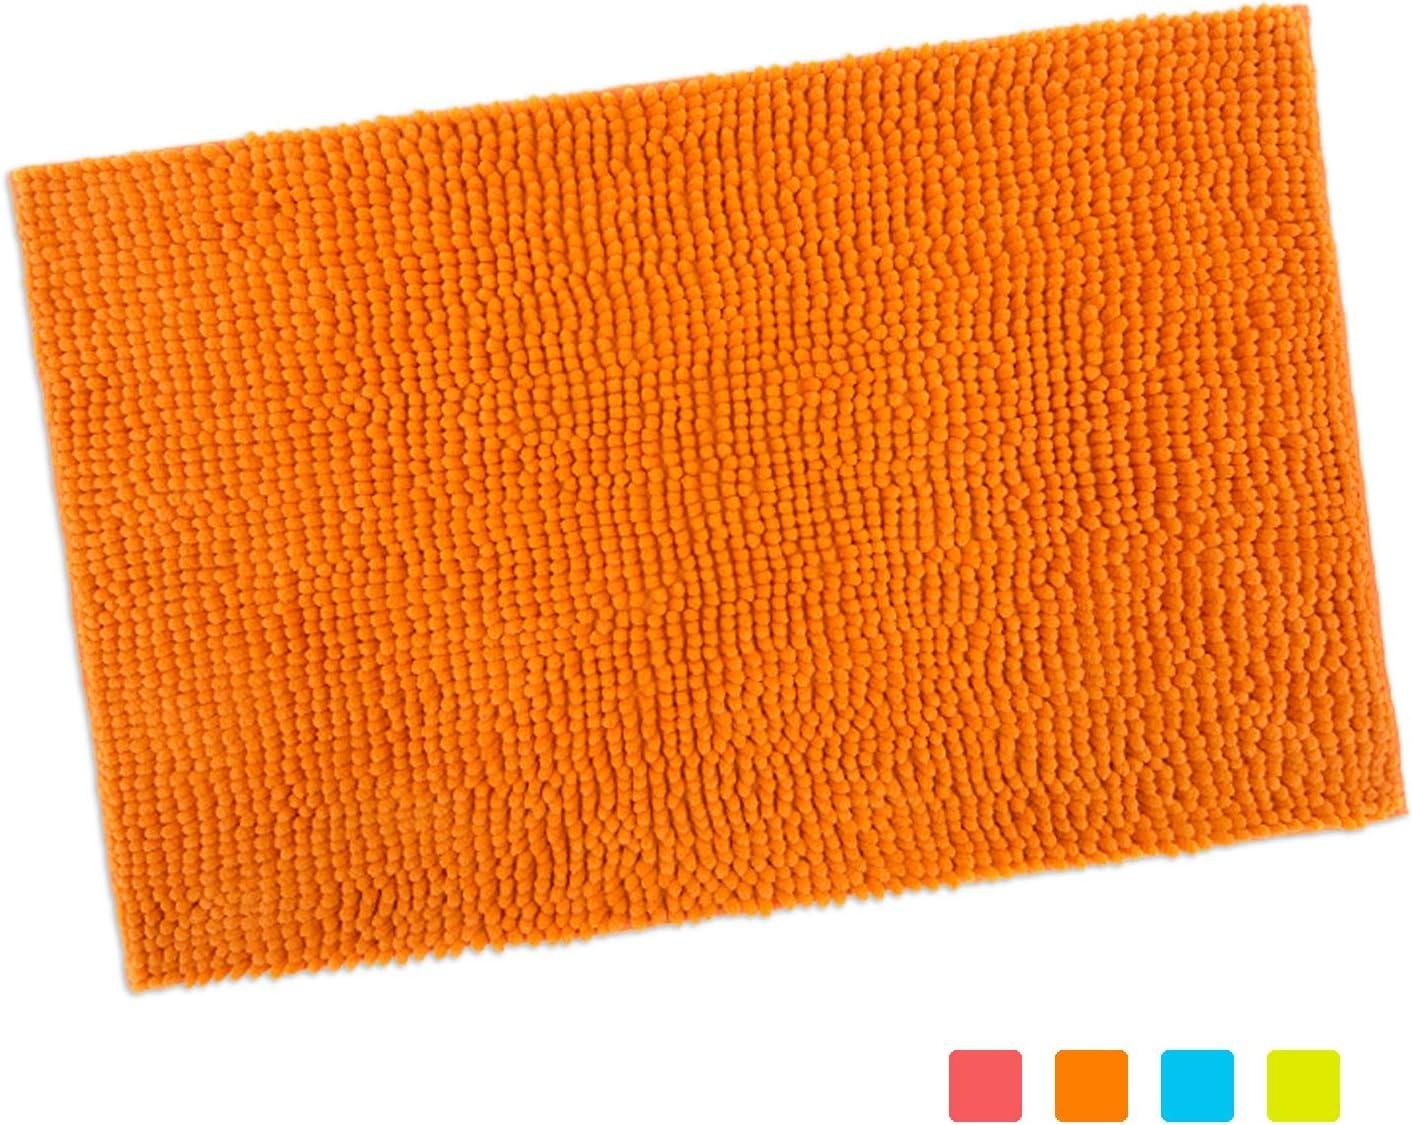 "purpleclay 100% Chenille Bath Mat Non Slip Machine Washable for Bathroom, Kitchen,Pets, Living and Play Room in Vibrant Color (16"" x 24"", Tangerine Orange)"